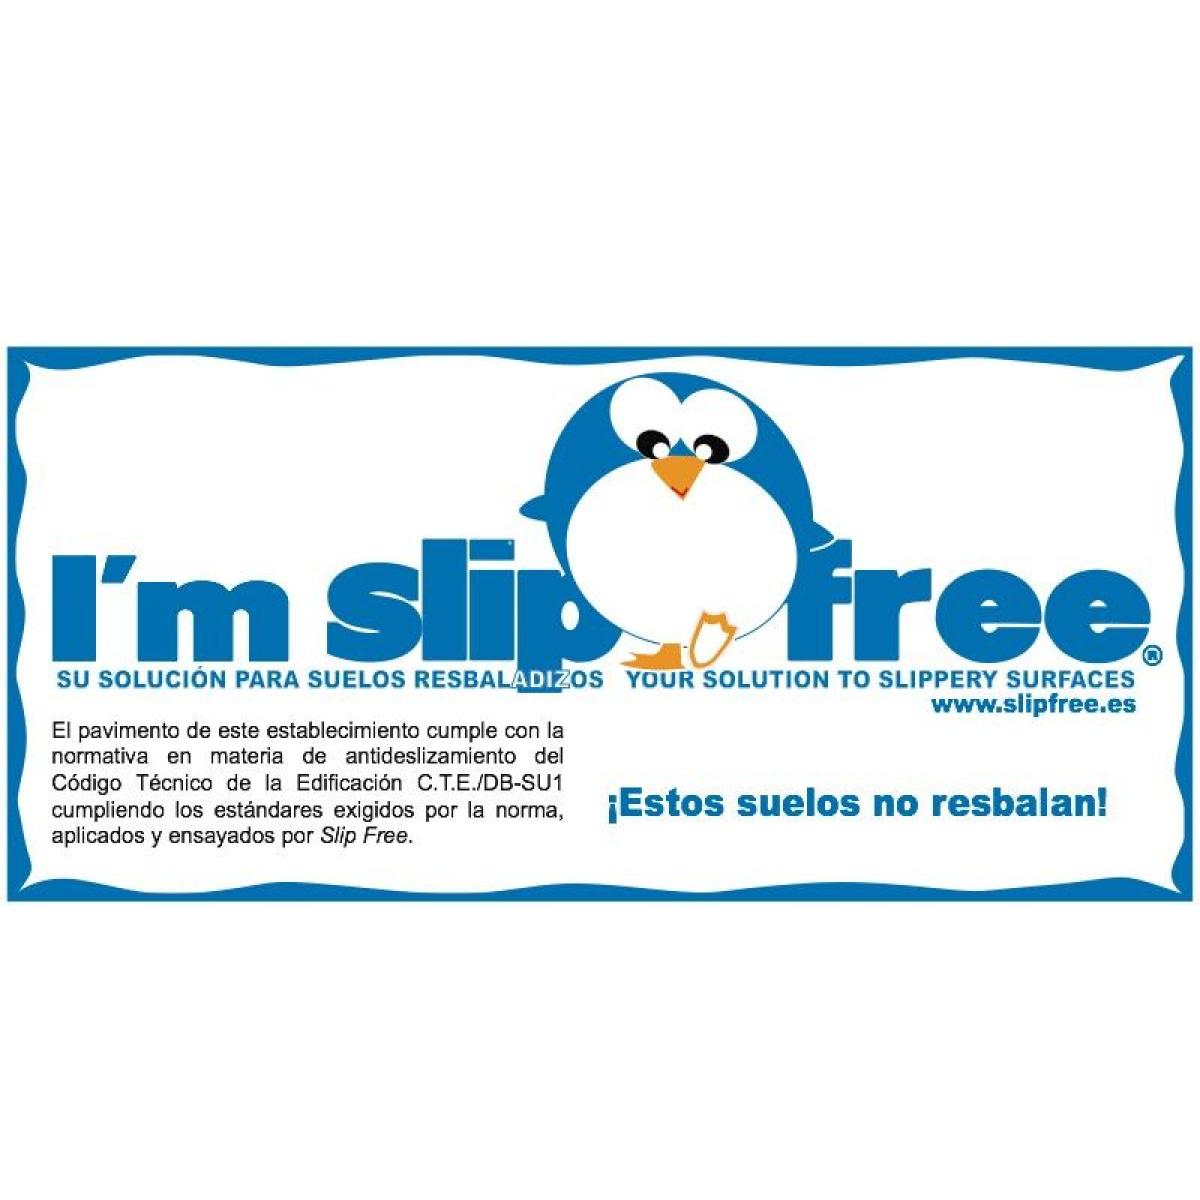 Slipfree es tu solucion antideslizante